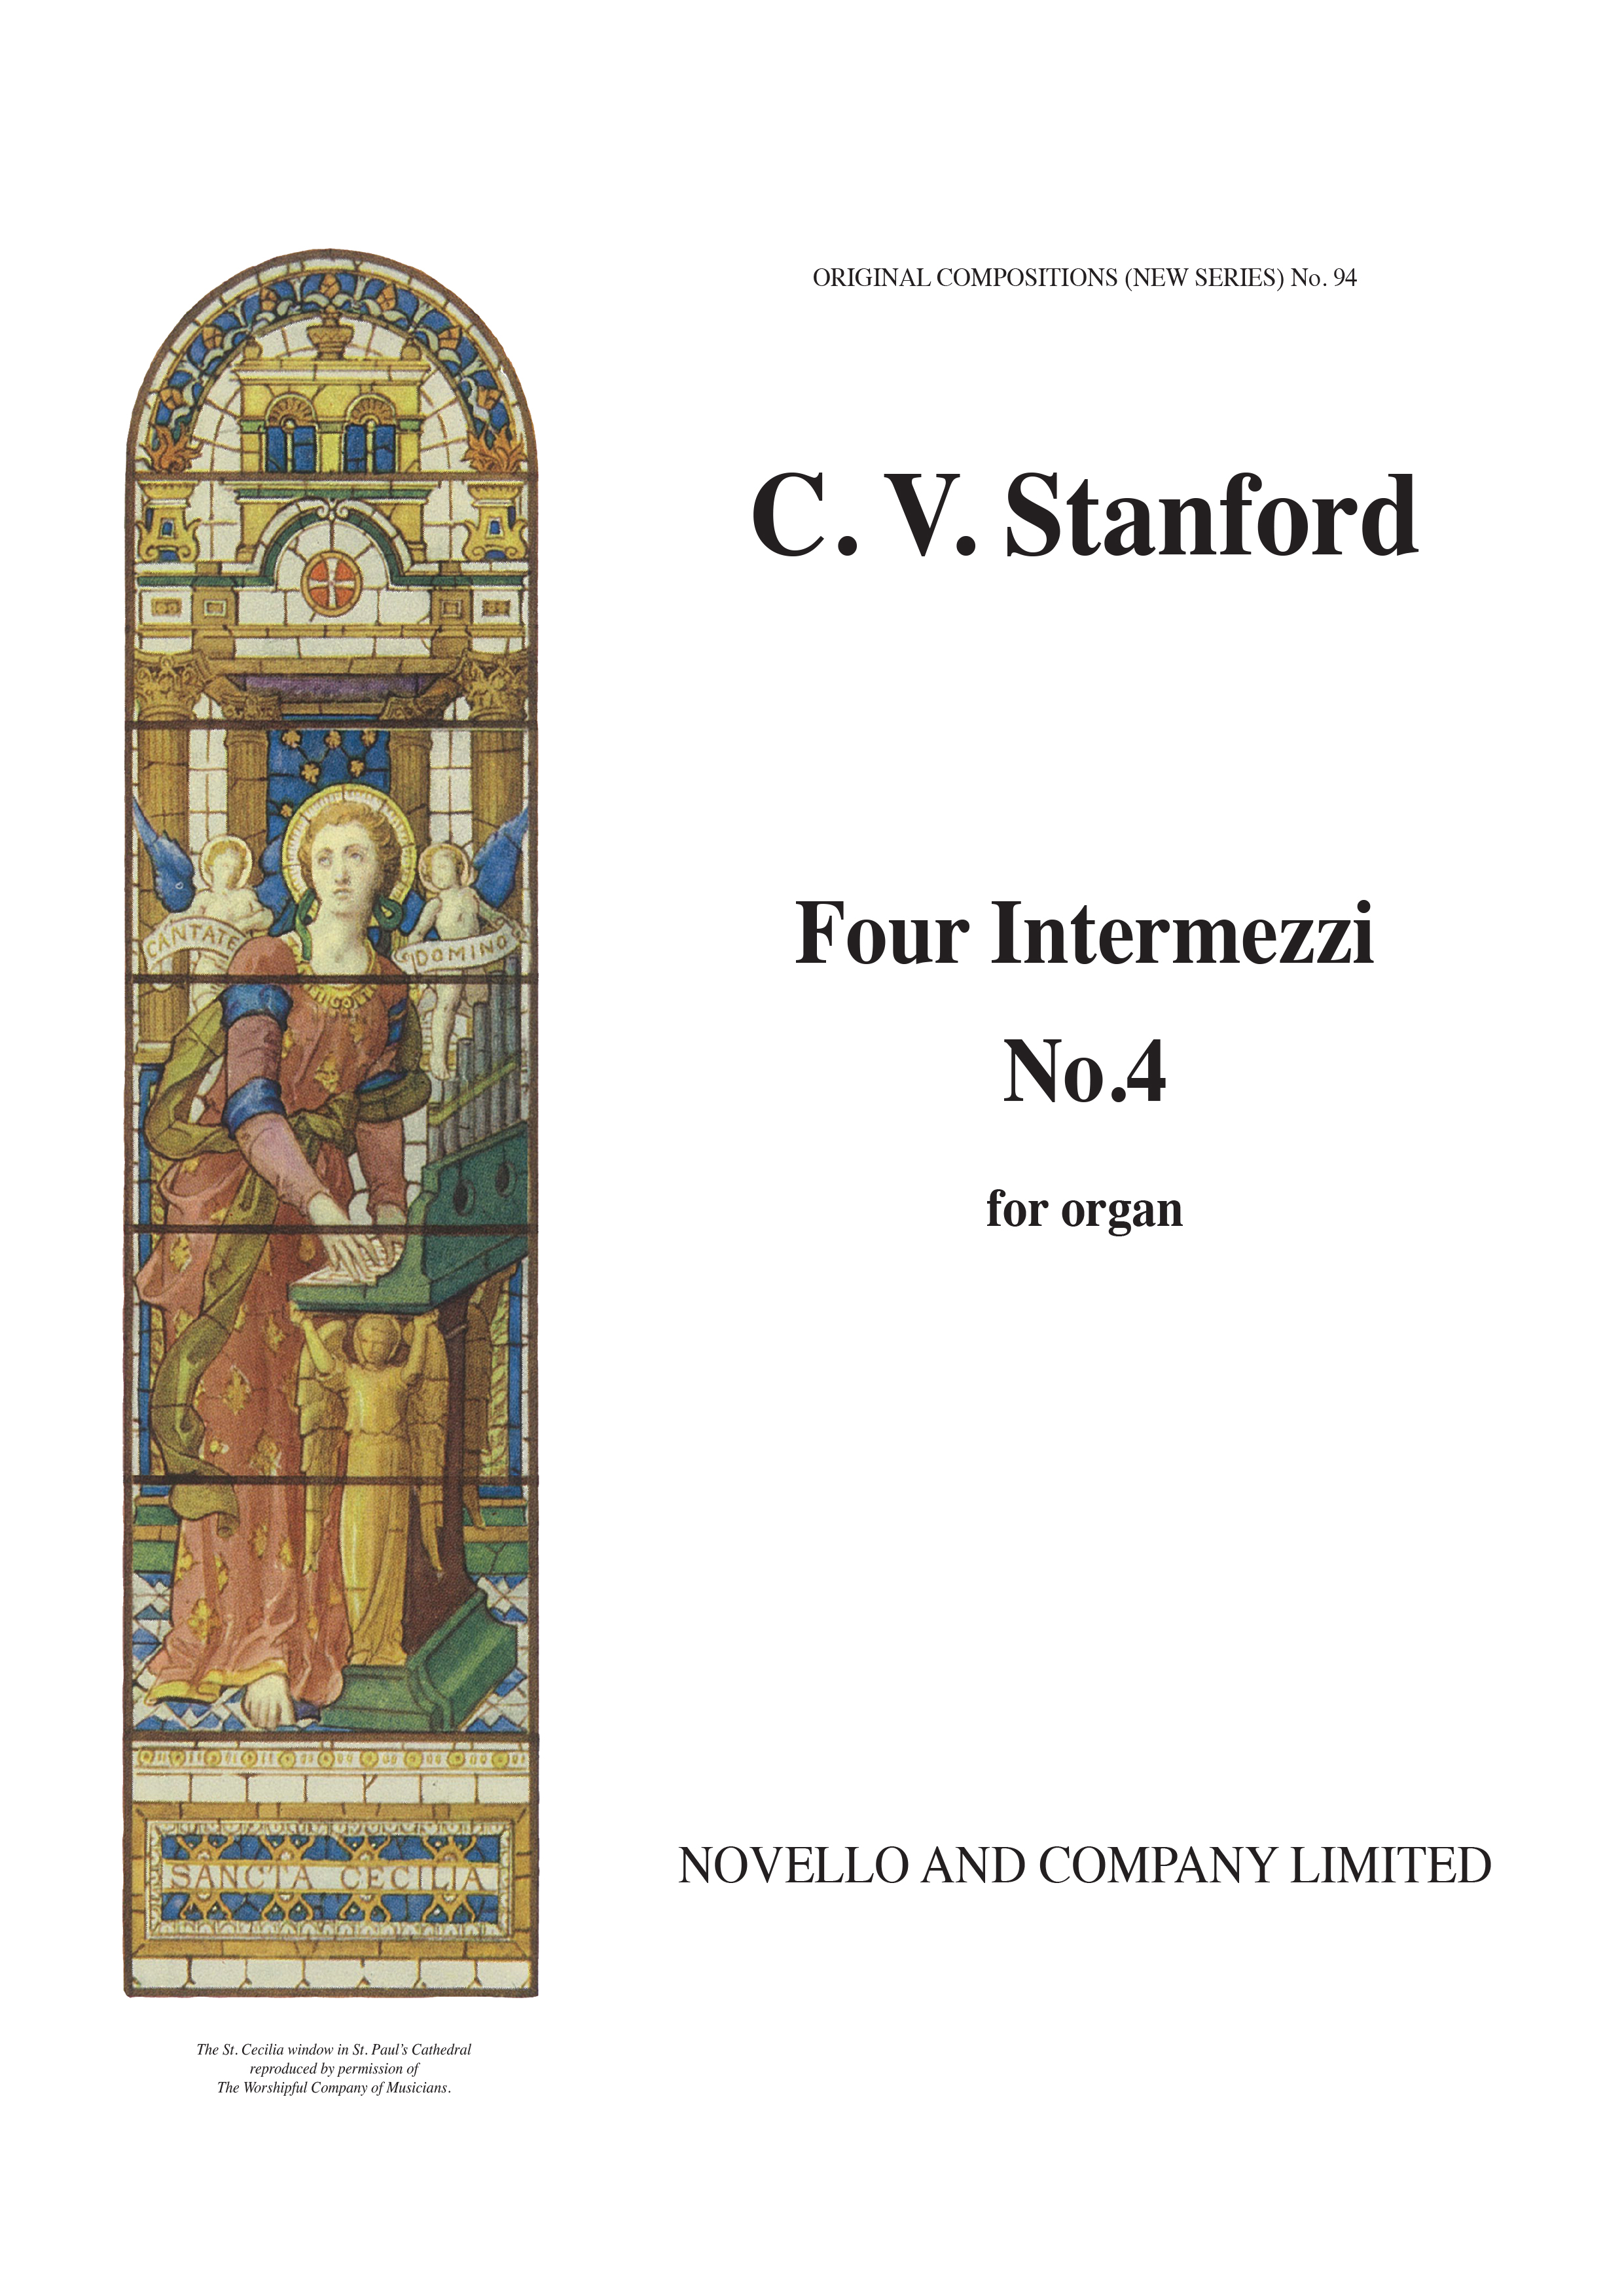 Charles Villiers Stanford: Intermezzo On An Irish Air: Organ: Instrumental Work